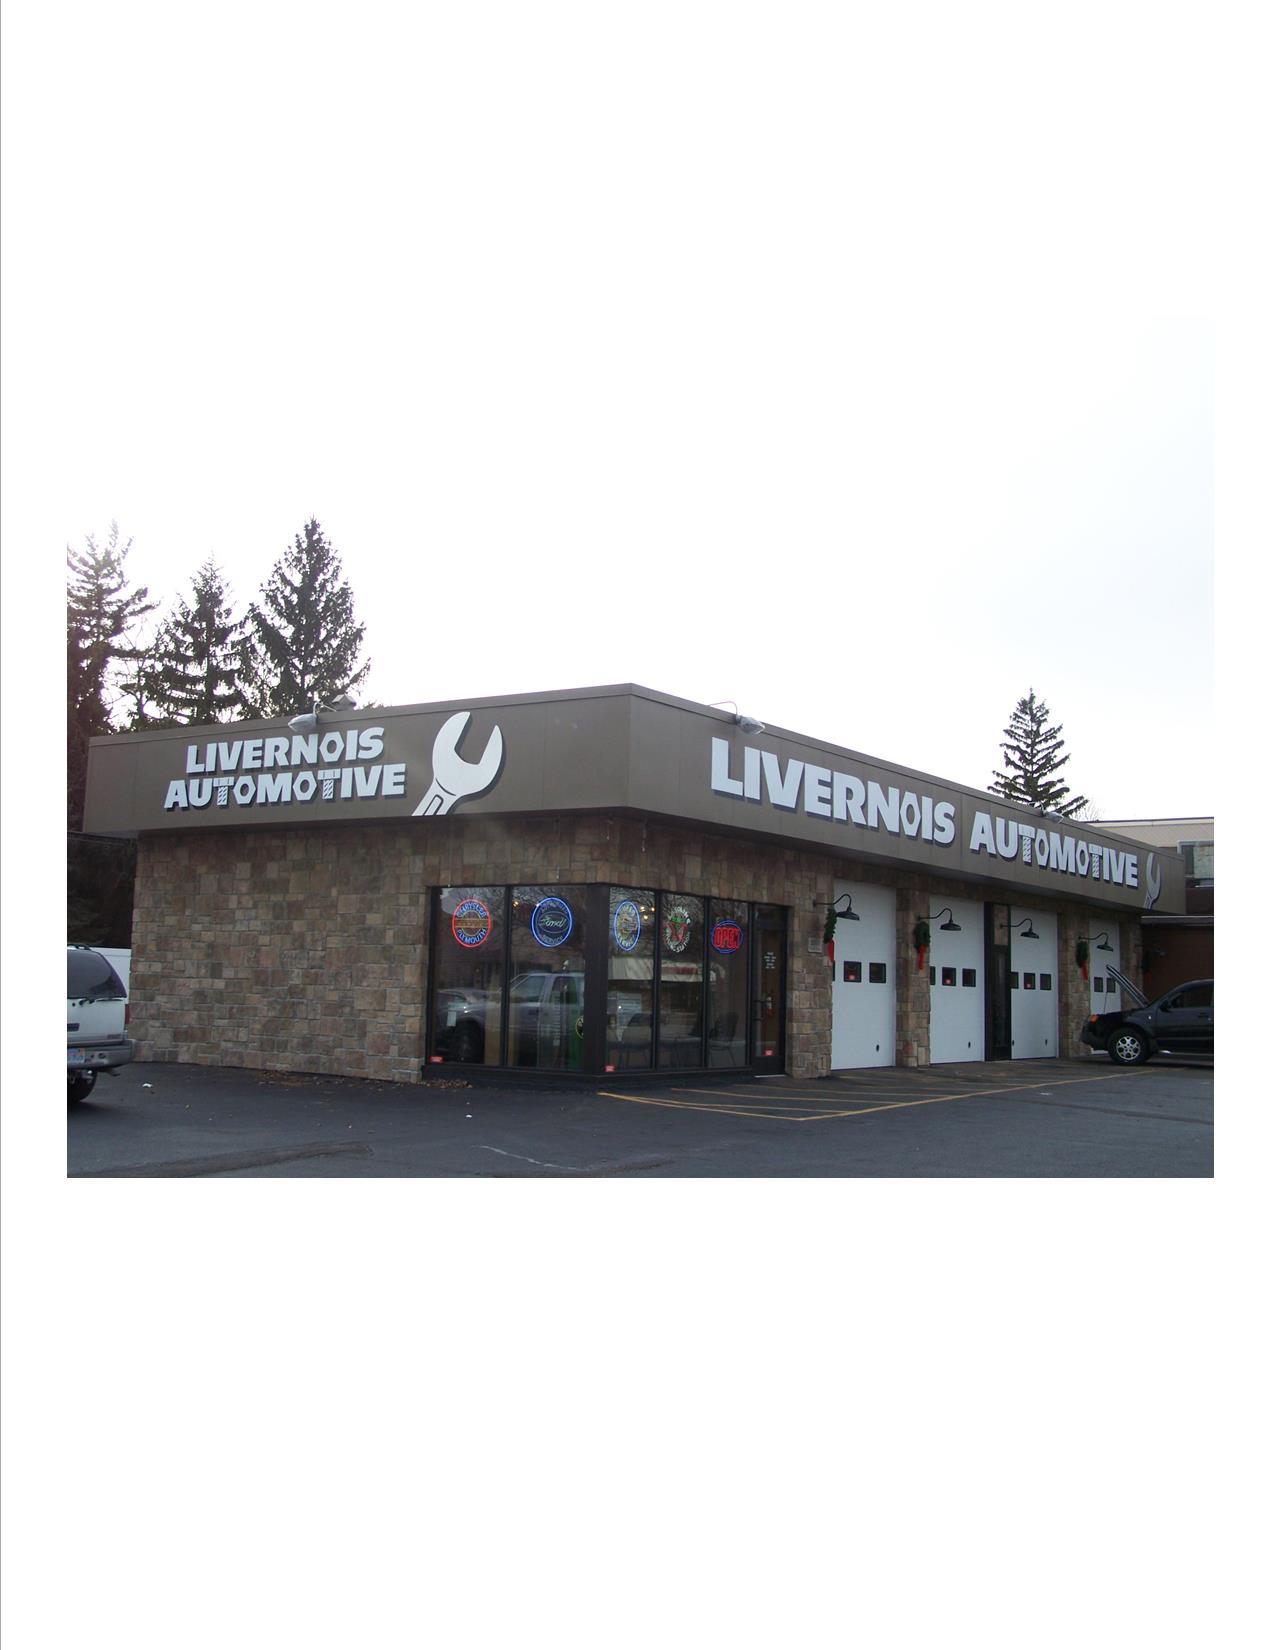 Livernois Automotive